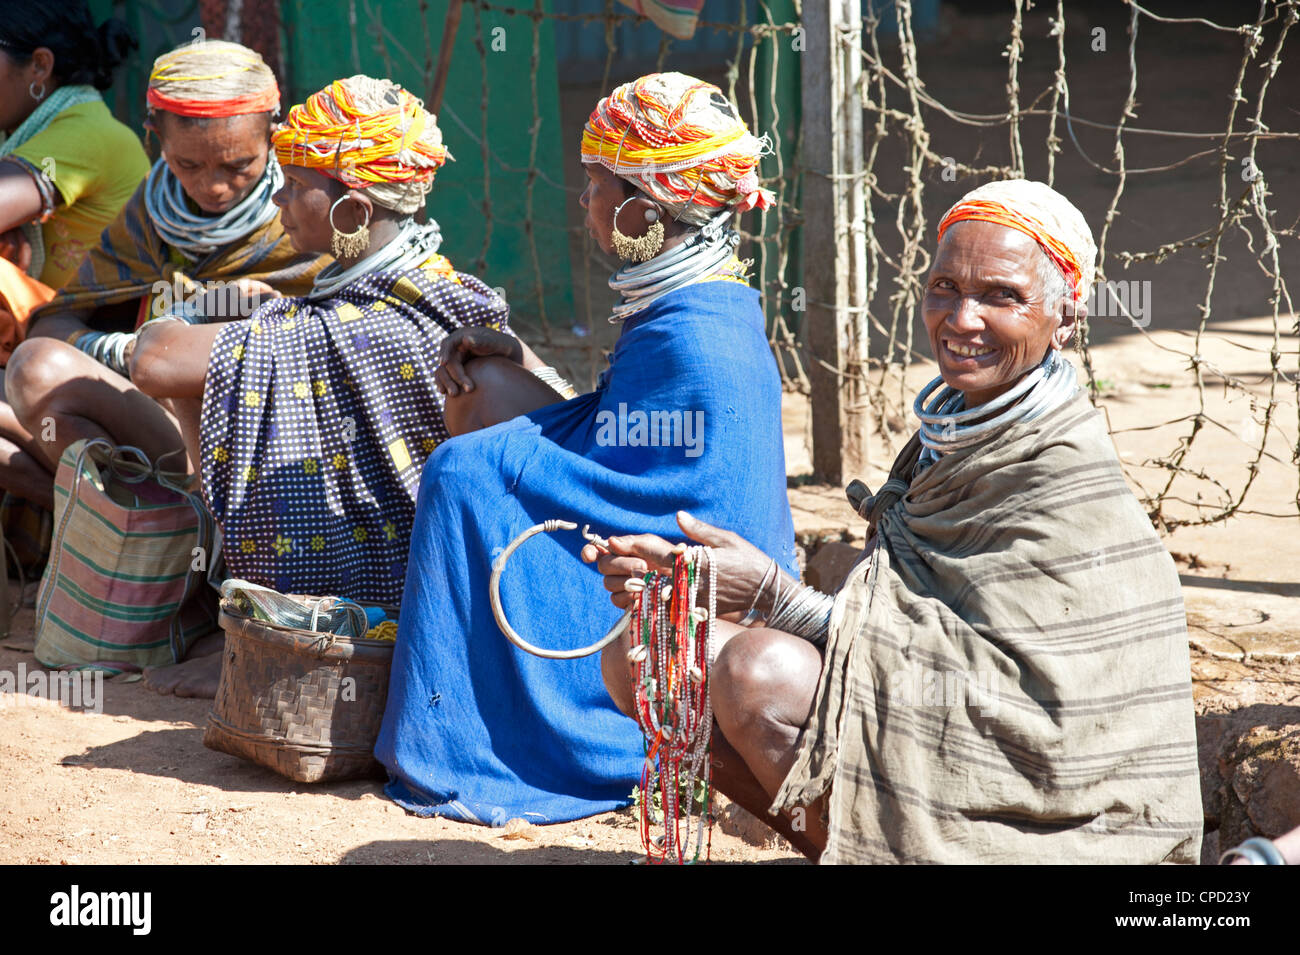 Bonda tribeswomen in traditional dress with beaded caps, Rayagader, Orissa, India - Stock Image